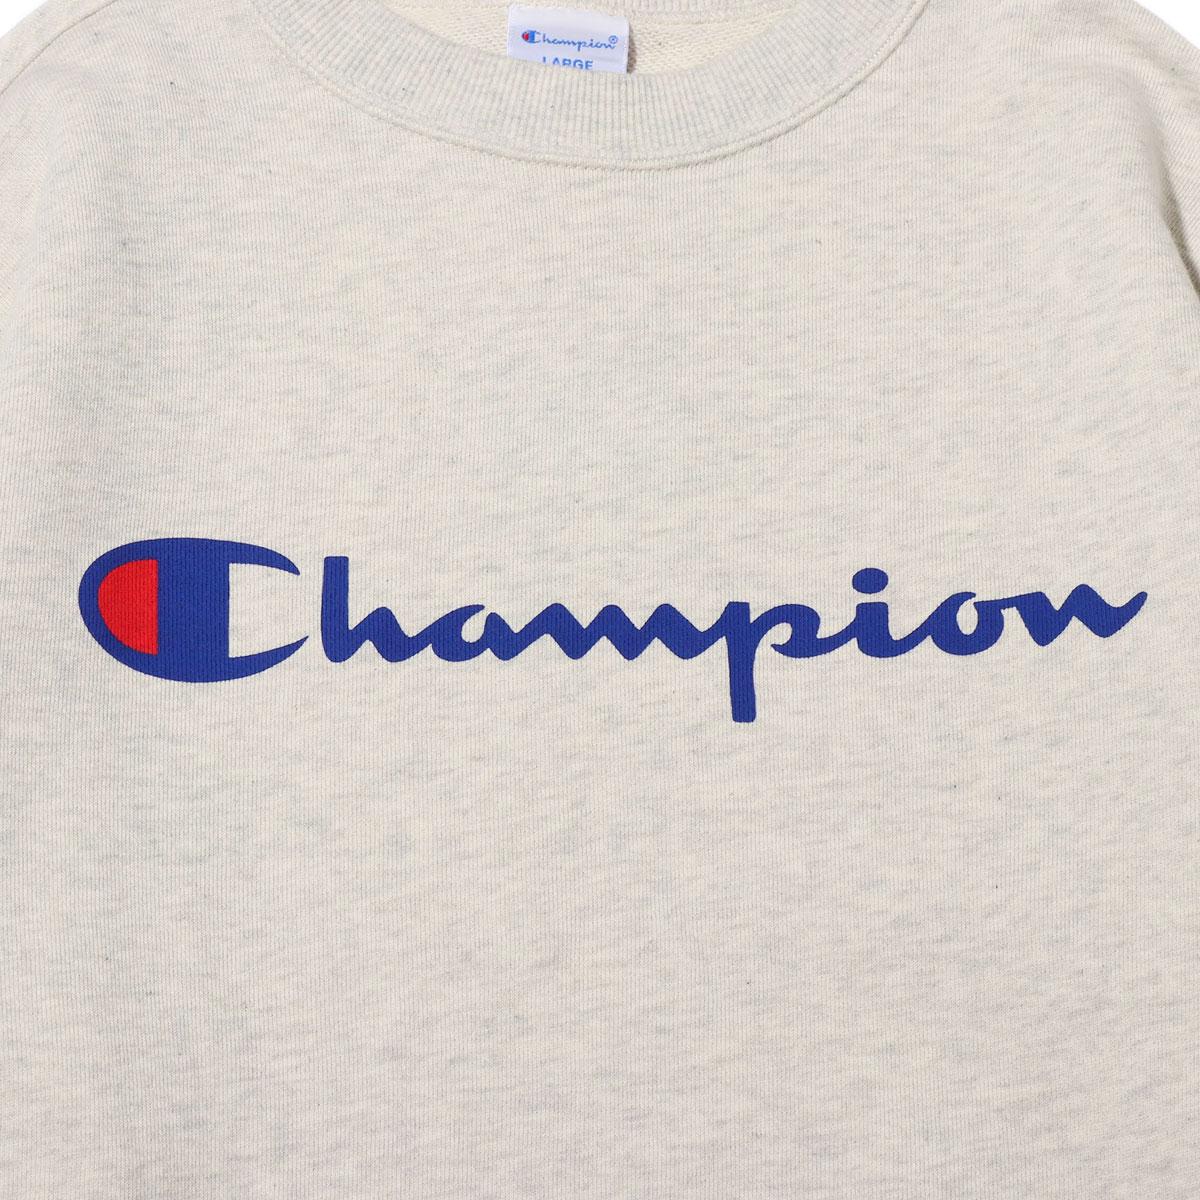 6750b8c96 ... Champion CREW NECK SWEATSHIRT (oatmeal) (champion crew neck sweat shirt)  ...